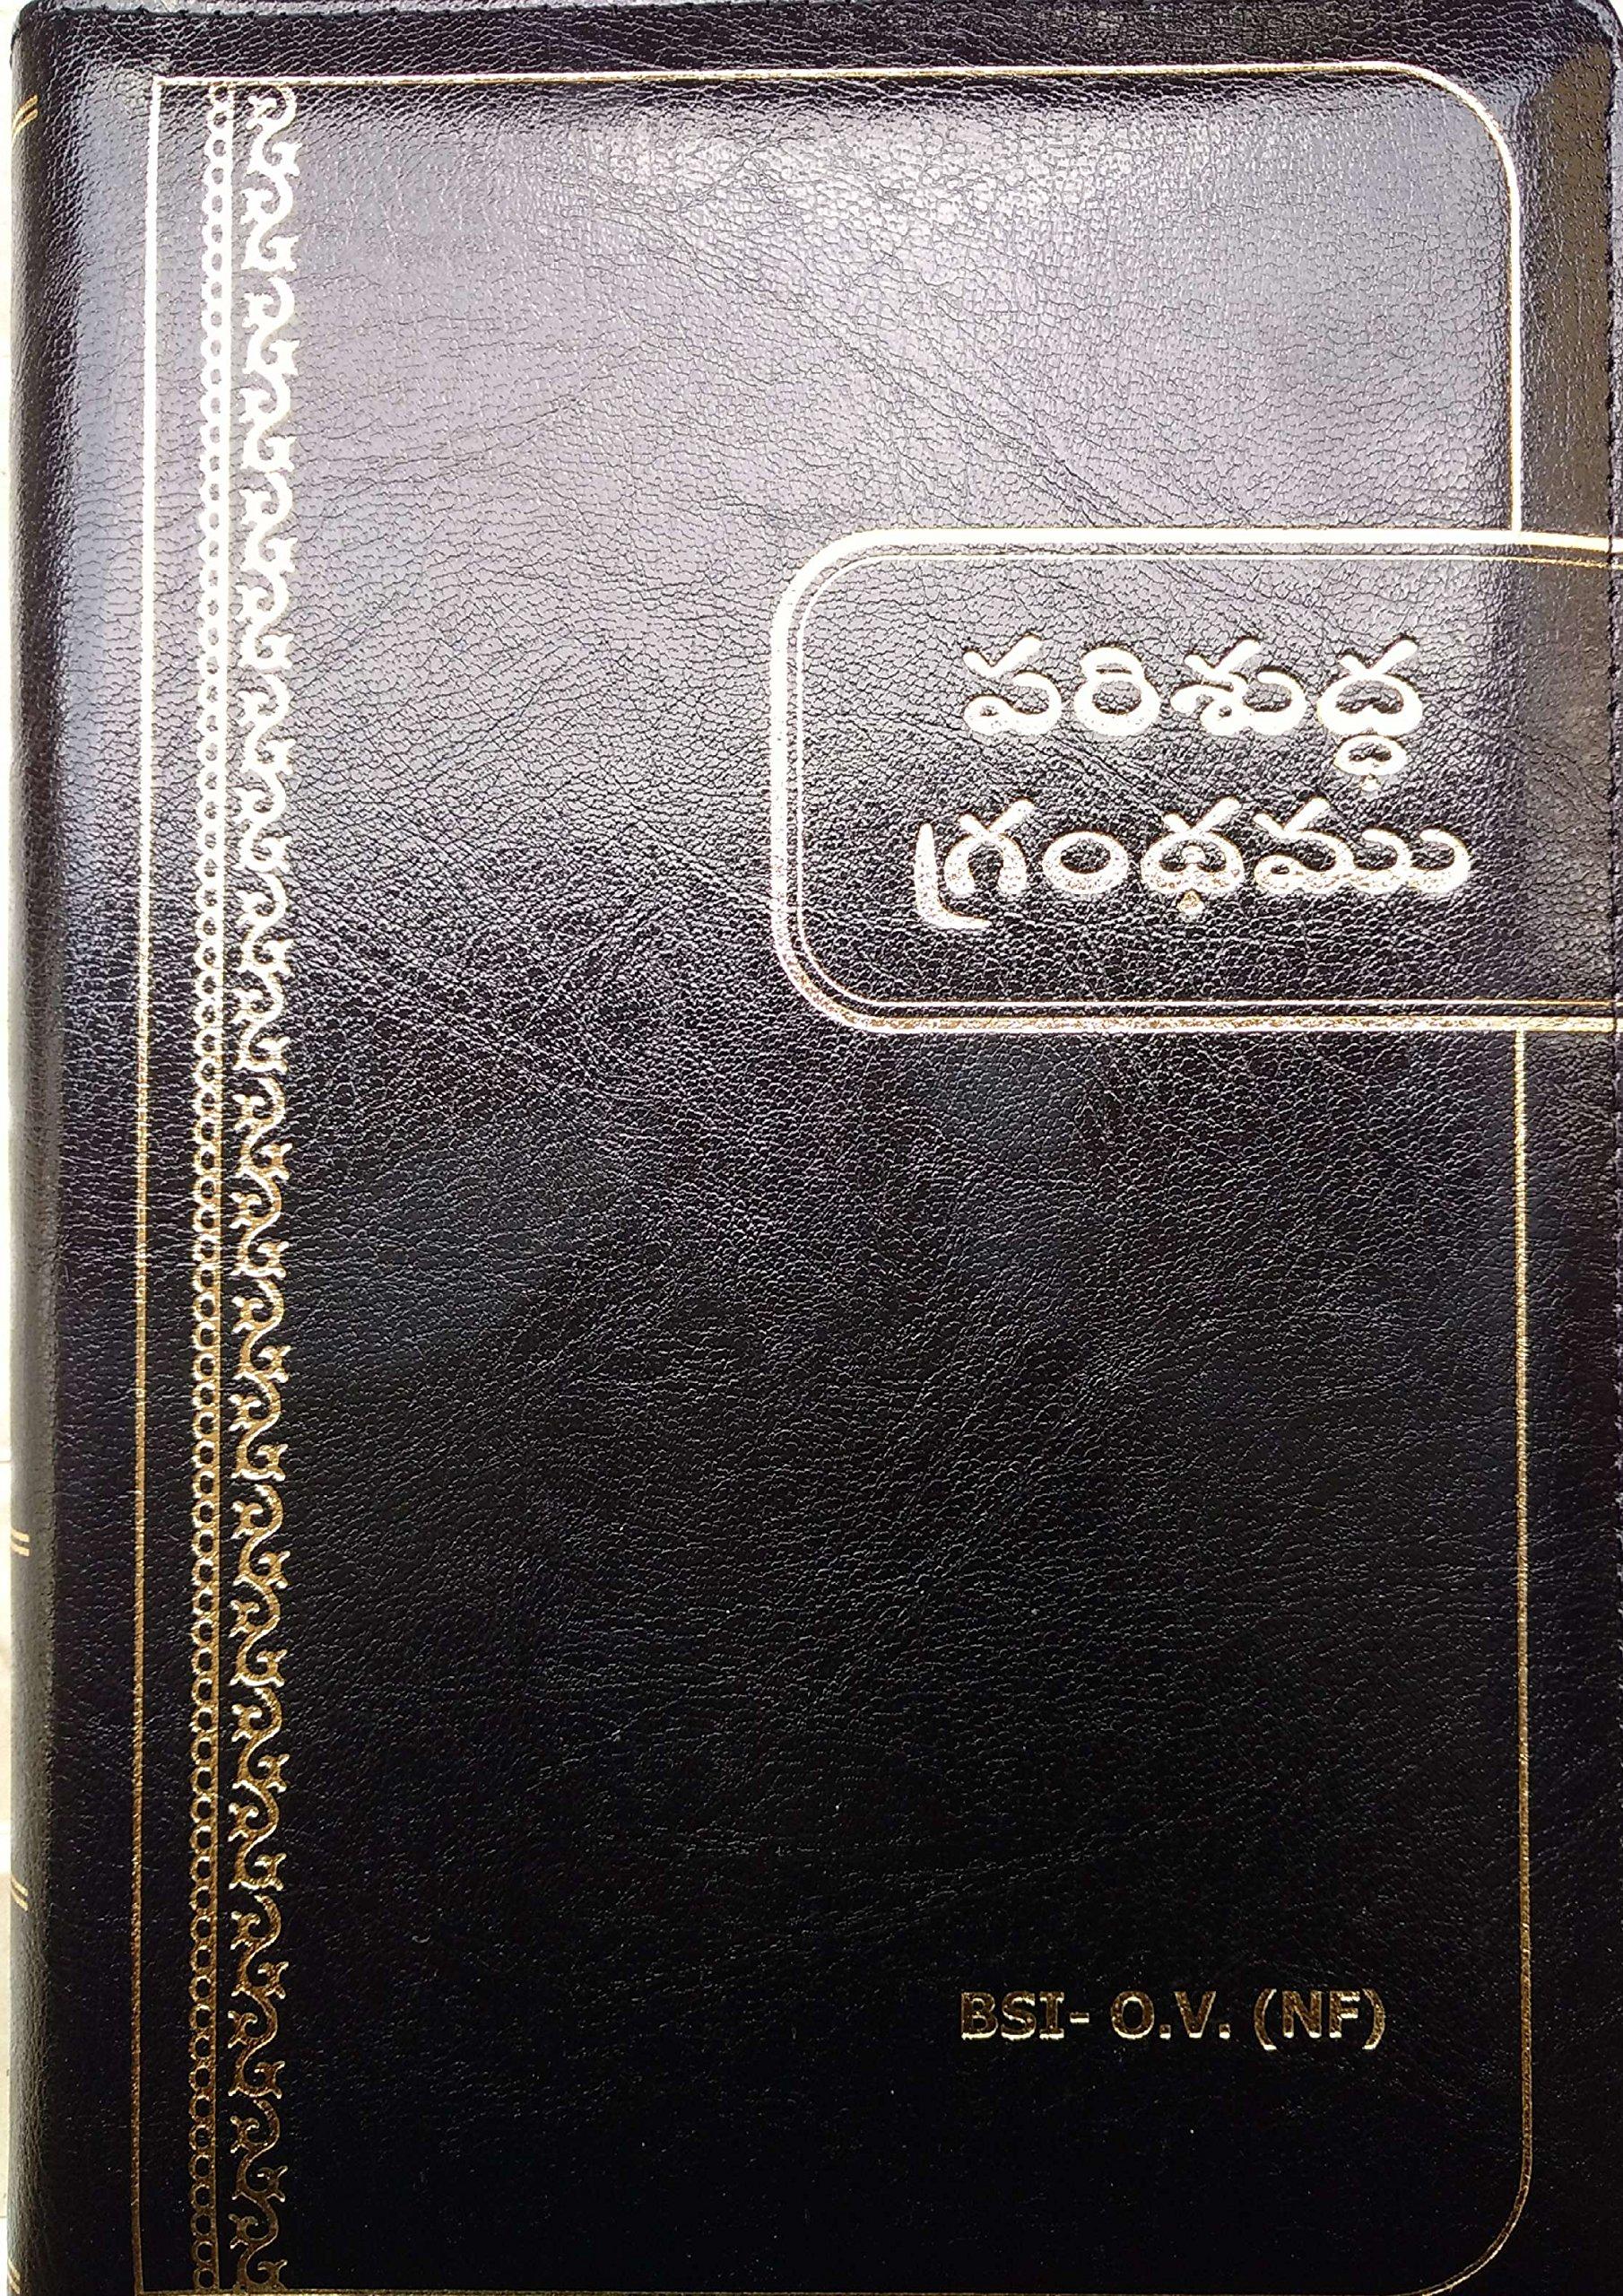 Buy Telugu Bible Korean Print with Gold Edge & Thumb Index